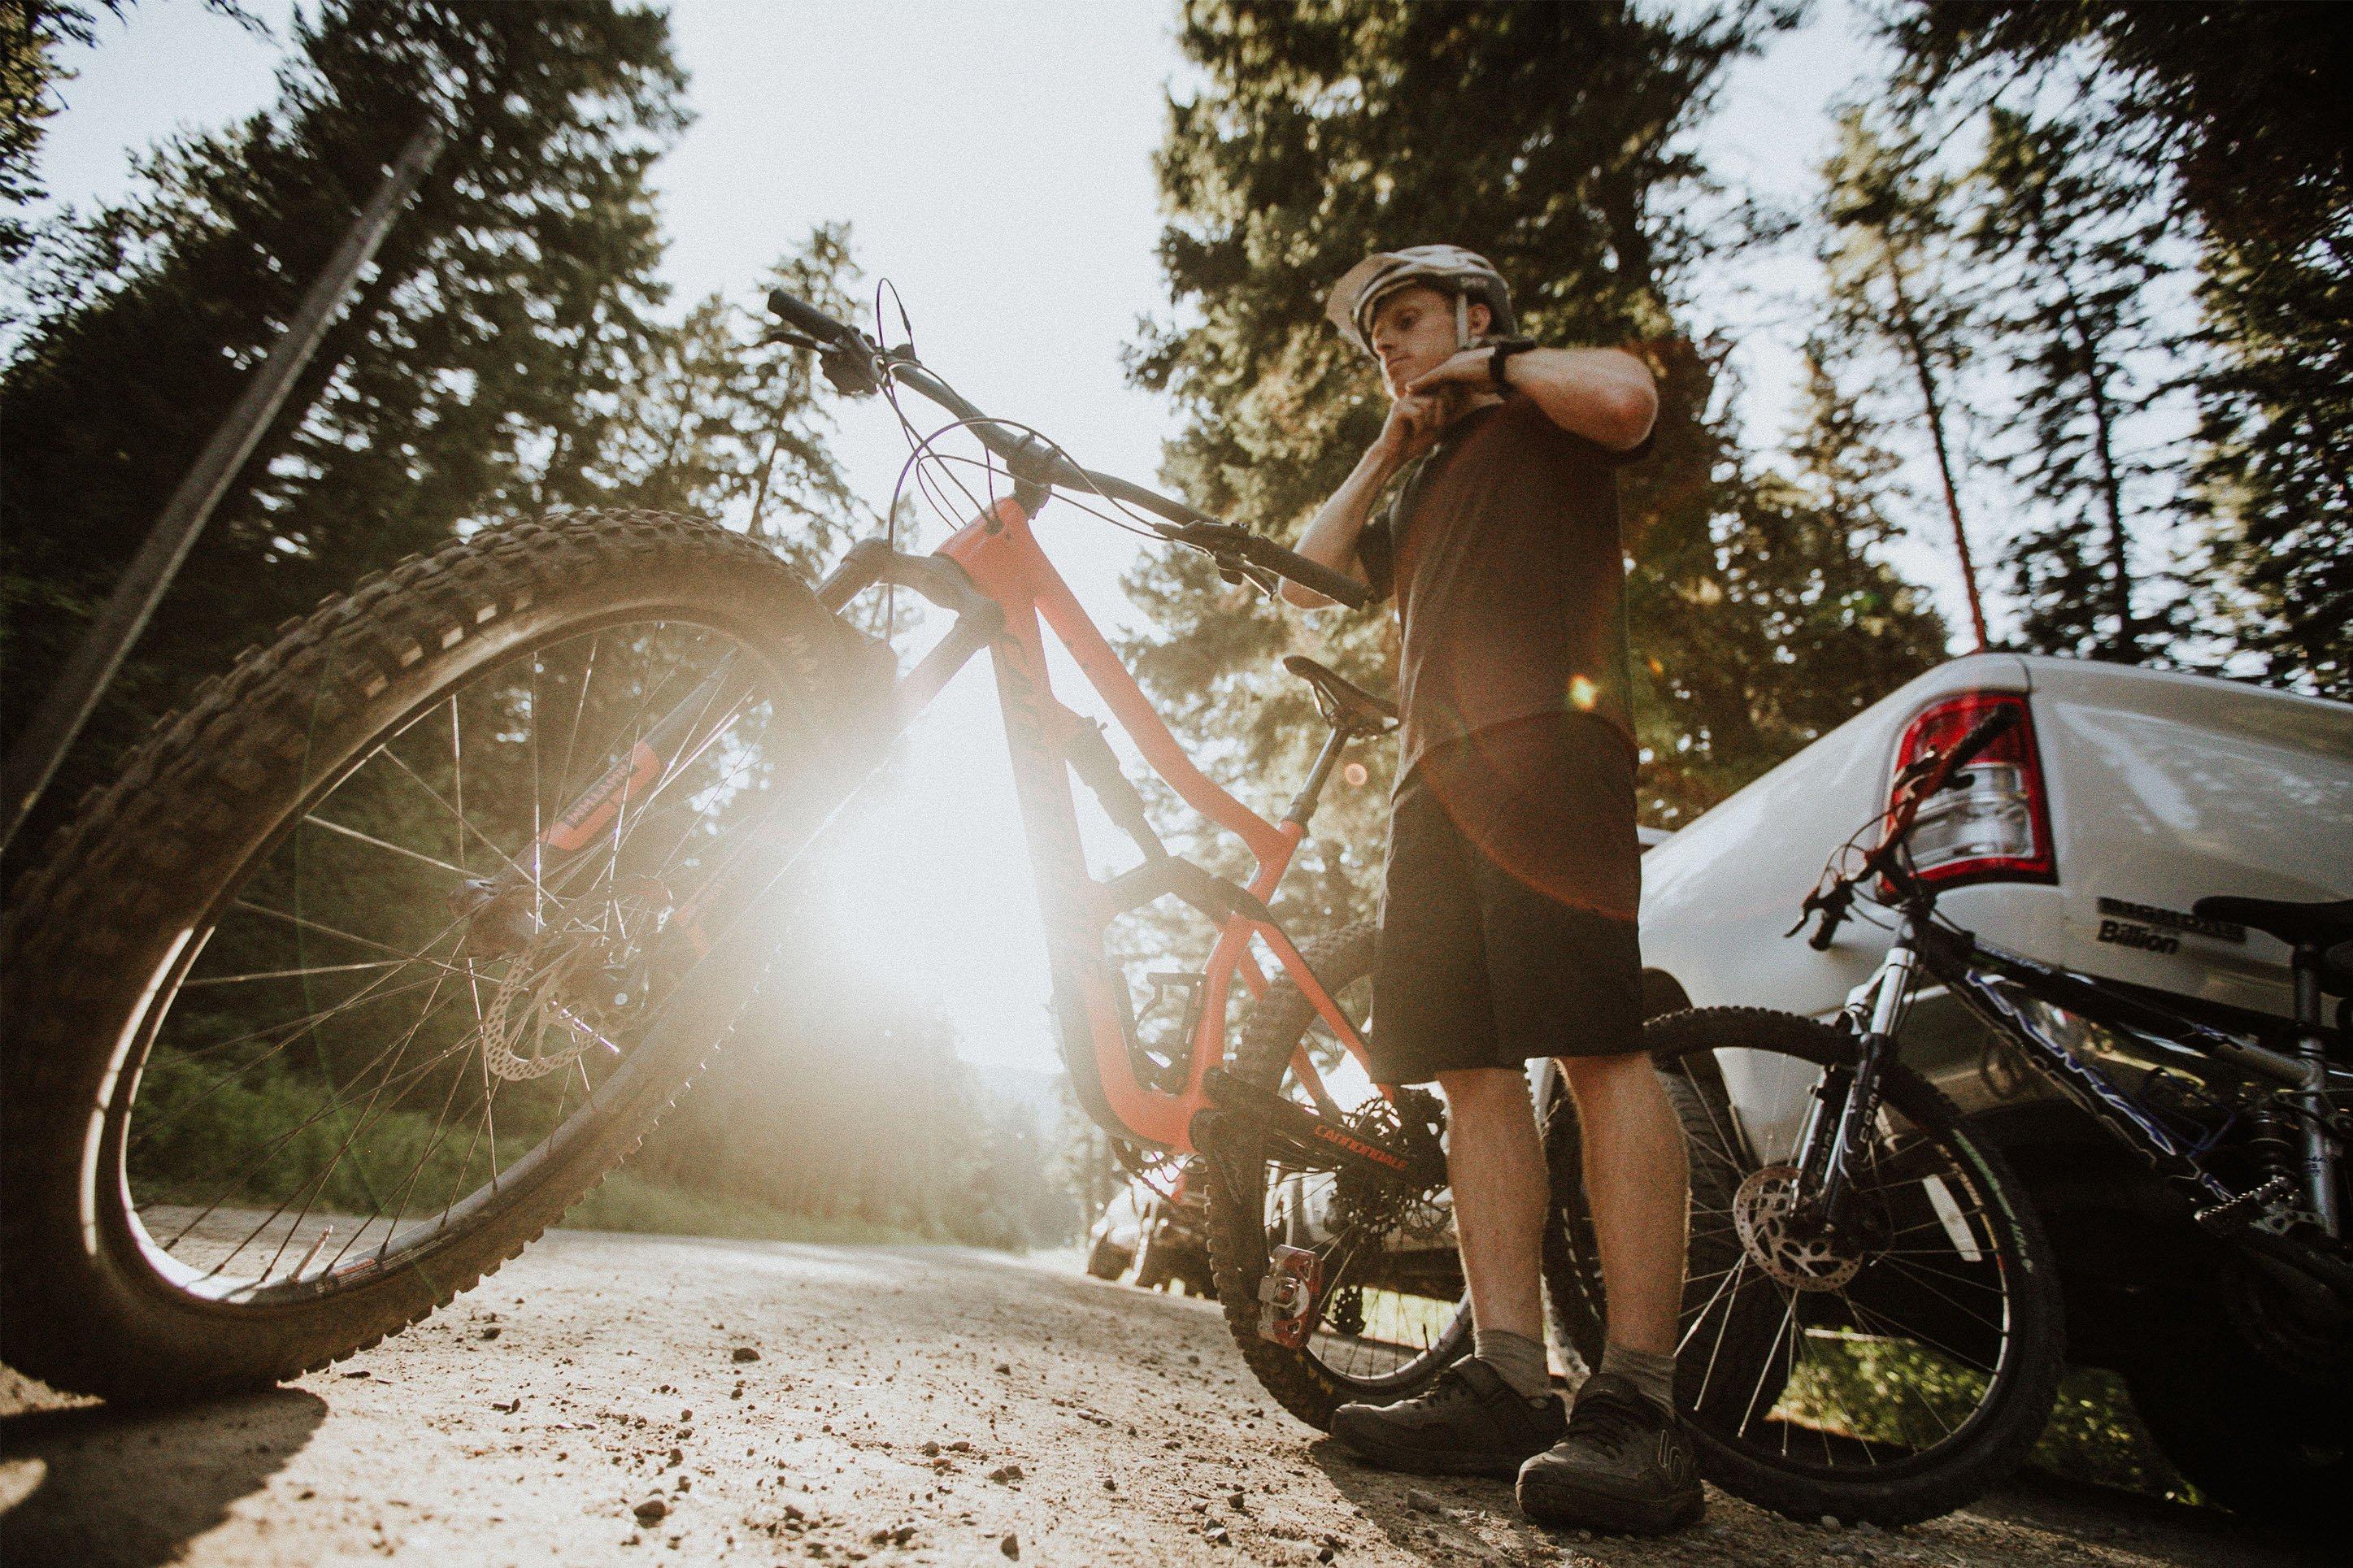 mountain biker preparing to go for a ride